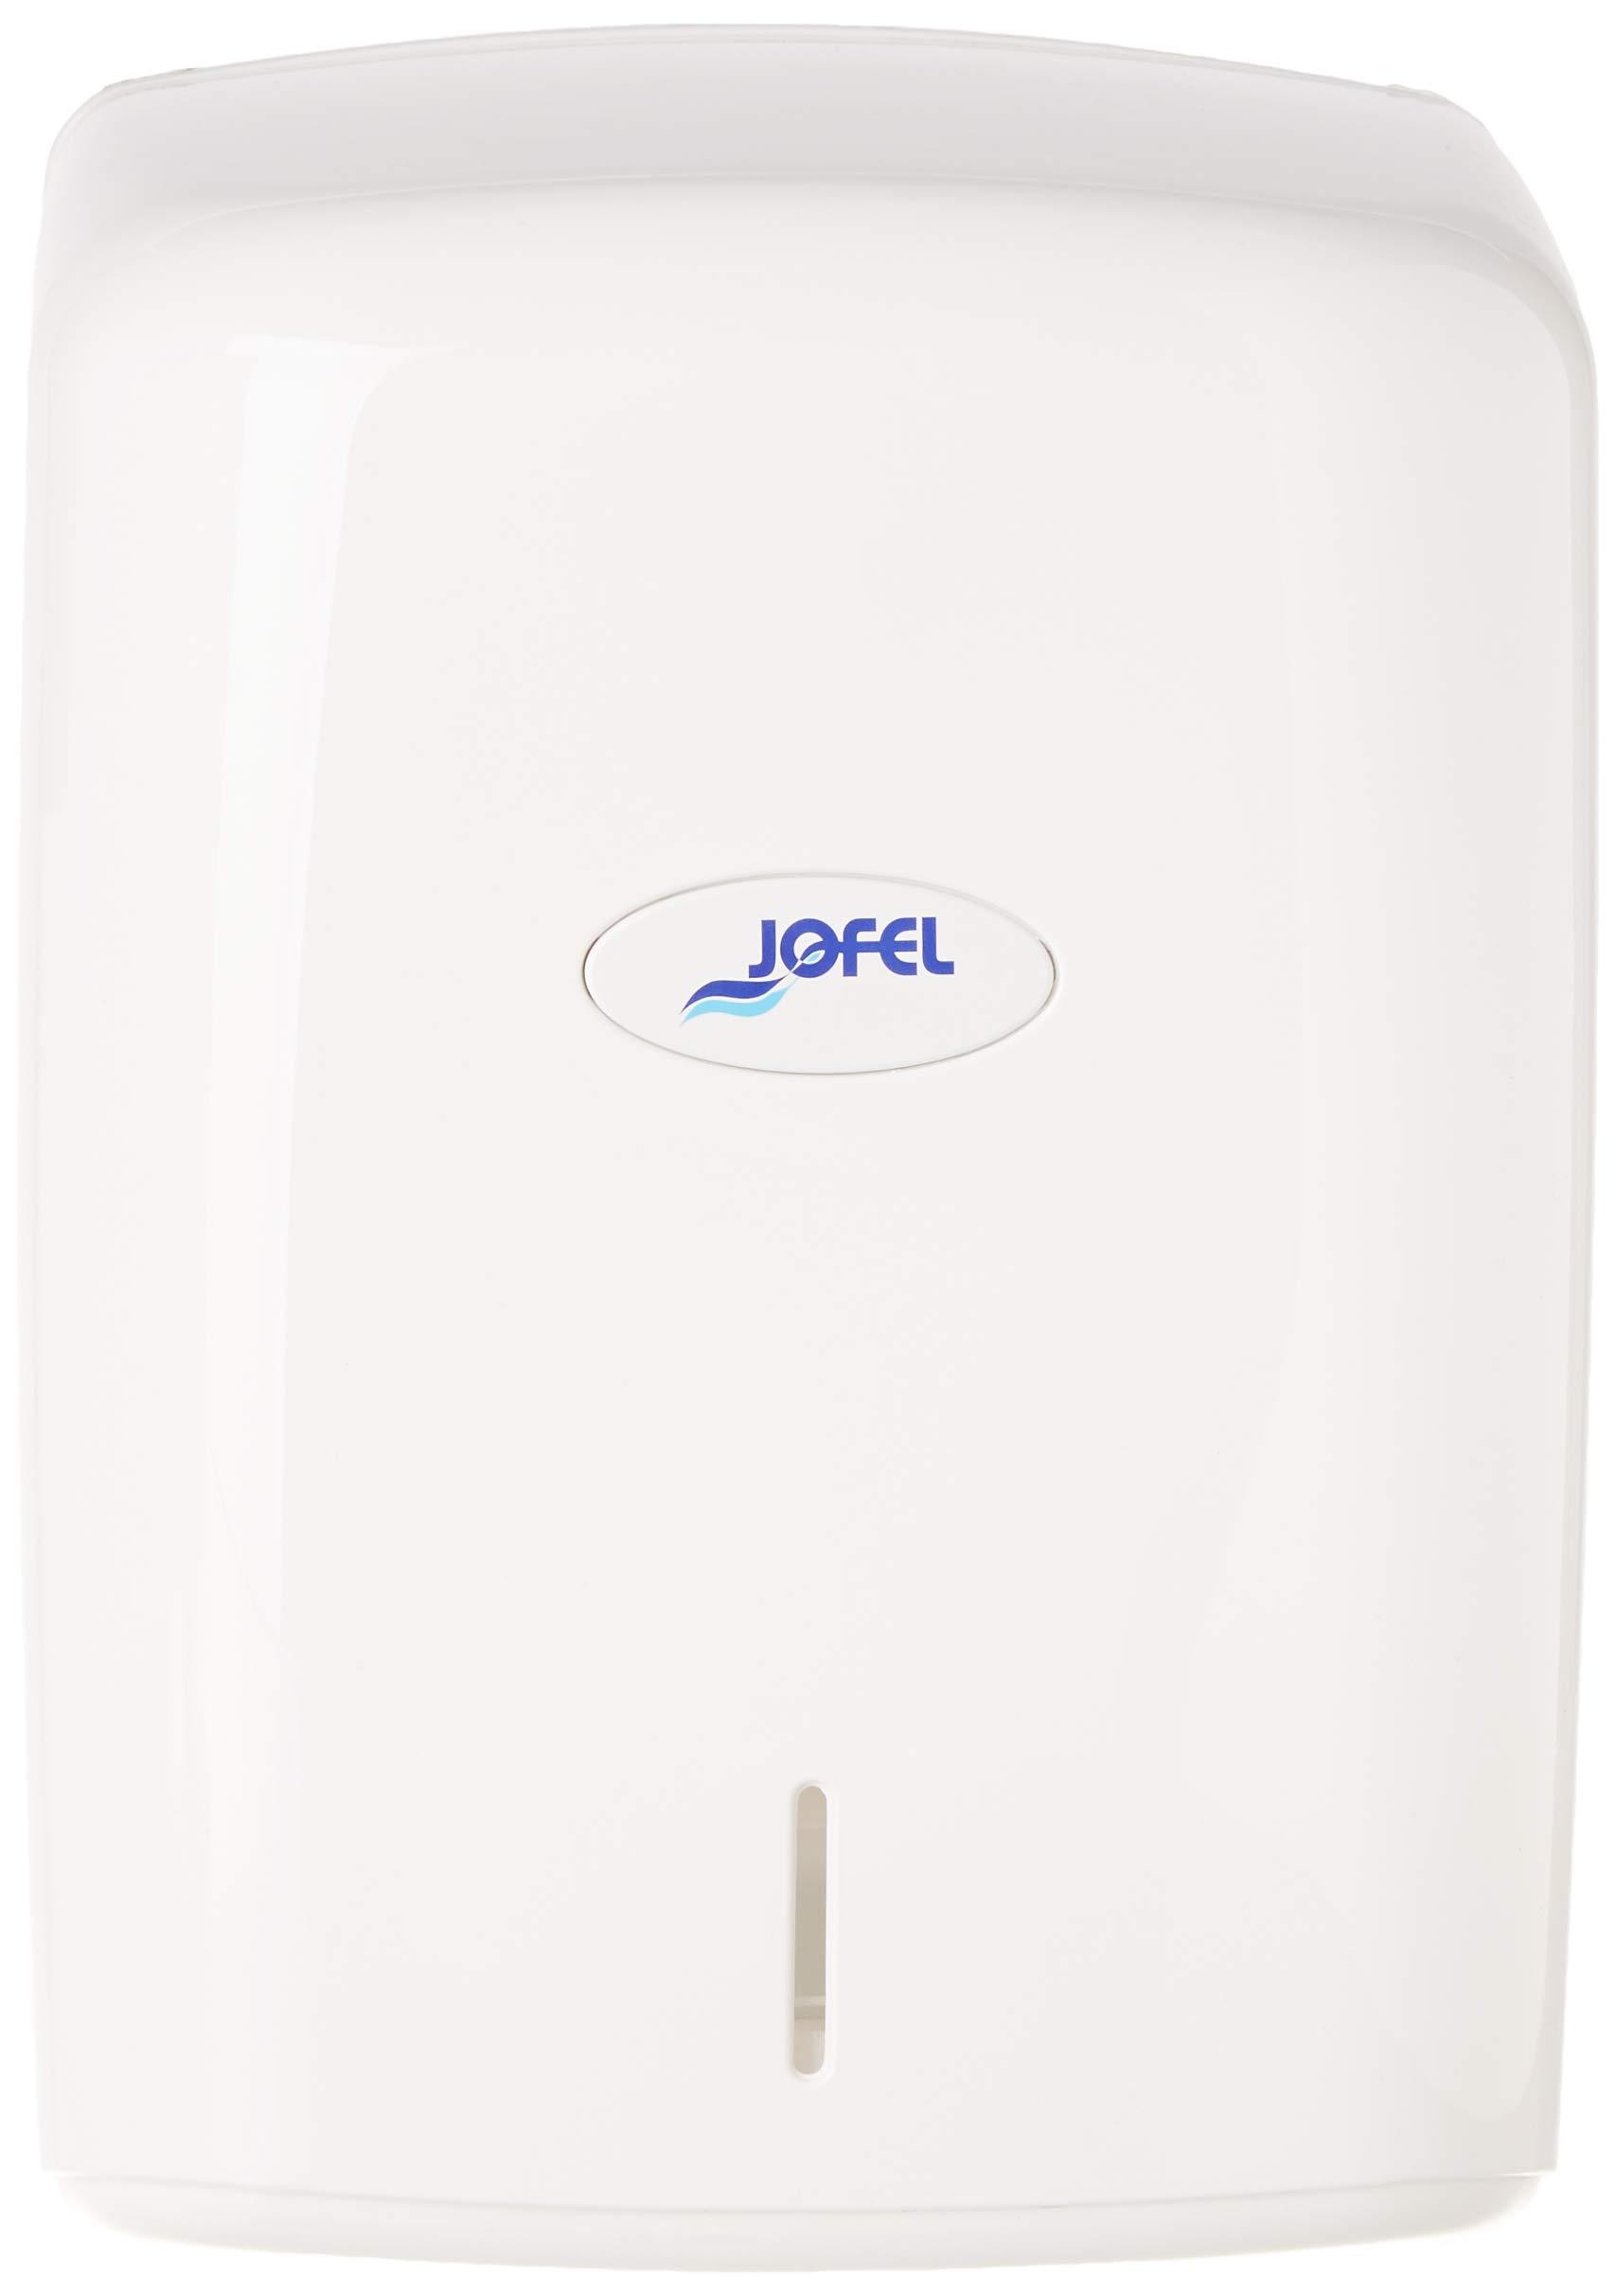 White Jofel Smart Paper Towel Round Dispenser